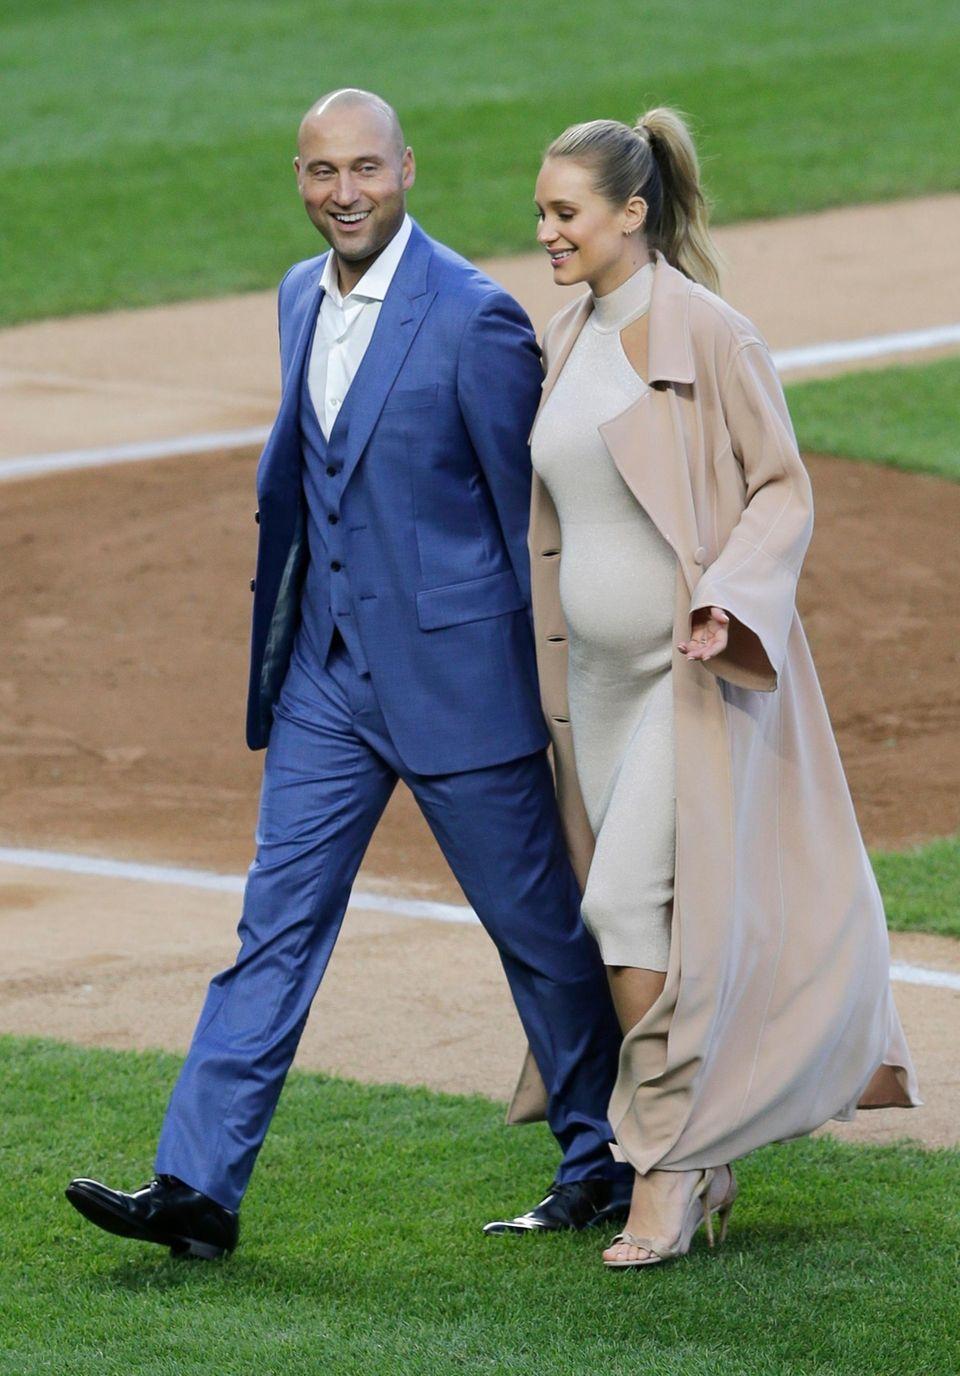 Former New York Yankee Derek Jeter and his